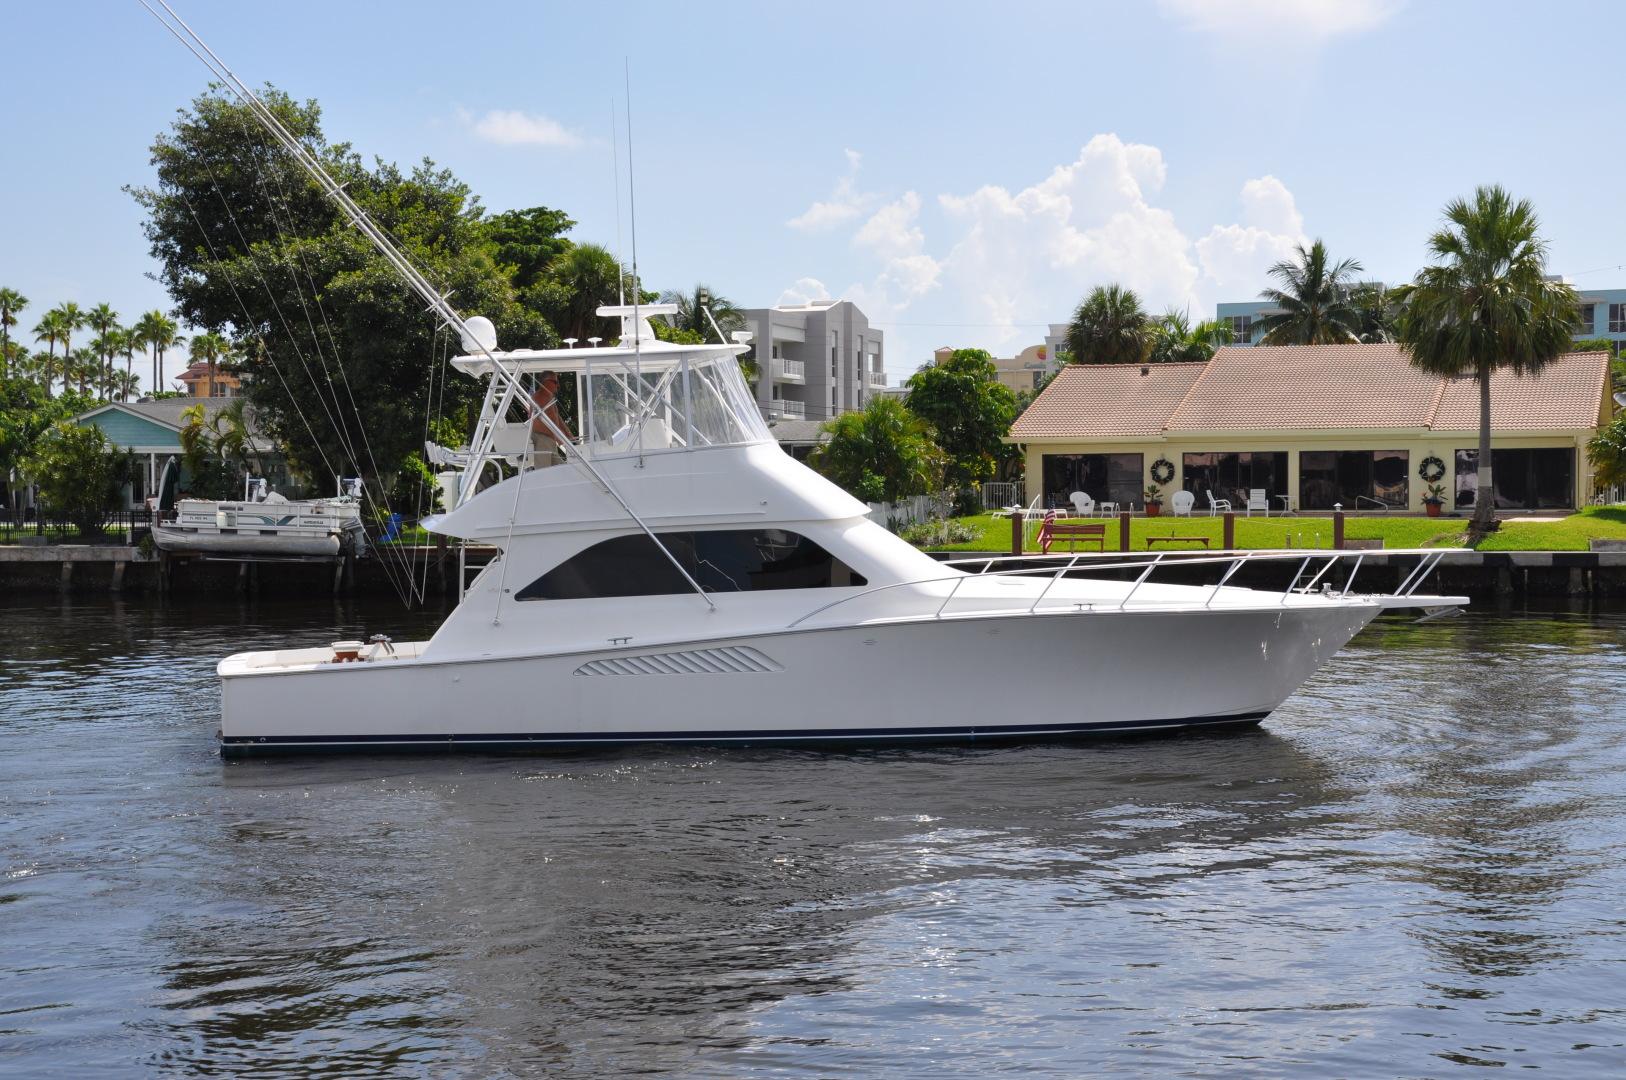 Viking-Convertible 2003-Reel Cowboy Deerfield Beach-Florida-United States-Profile-1546862 | Thumbnail